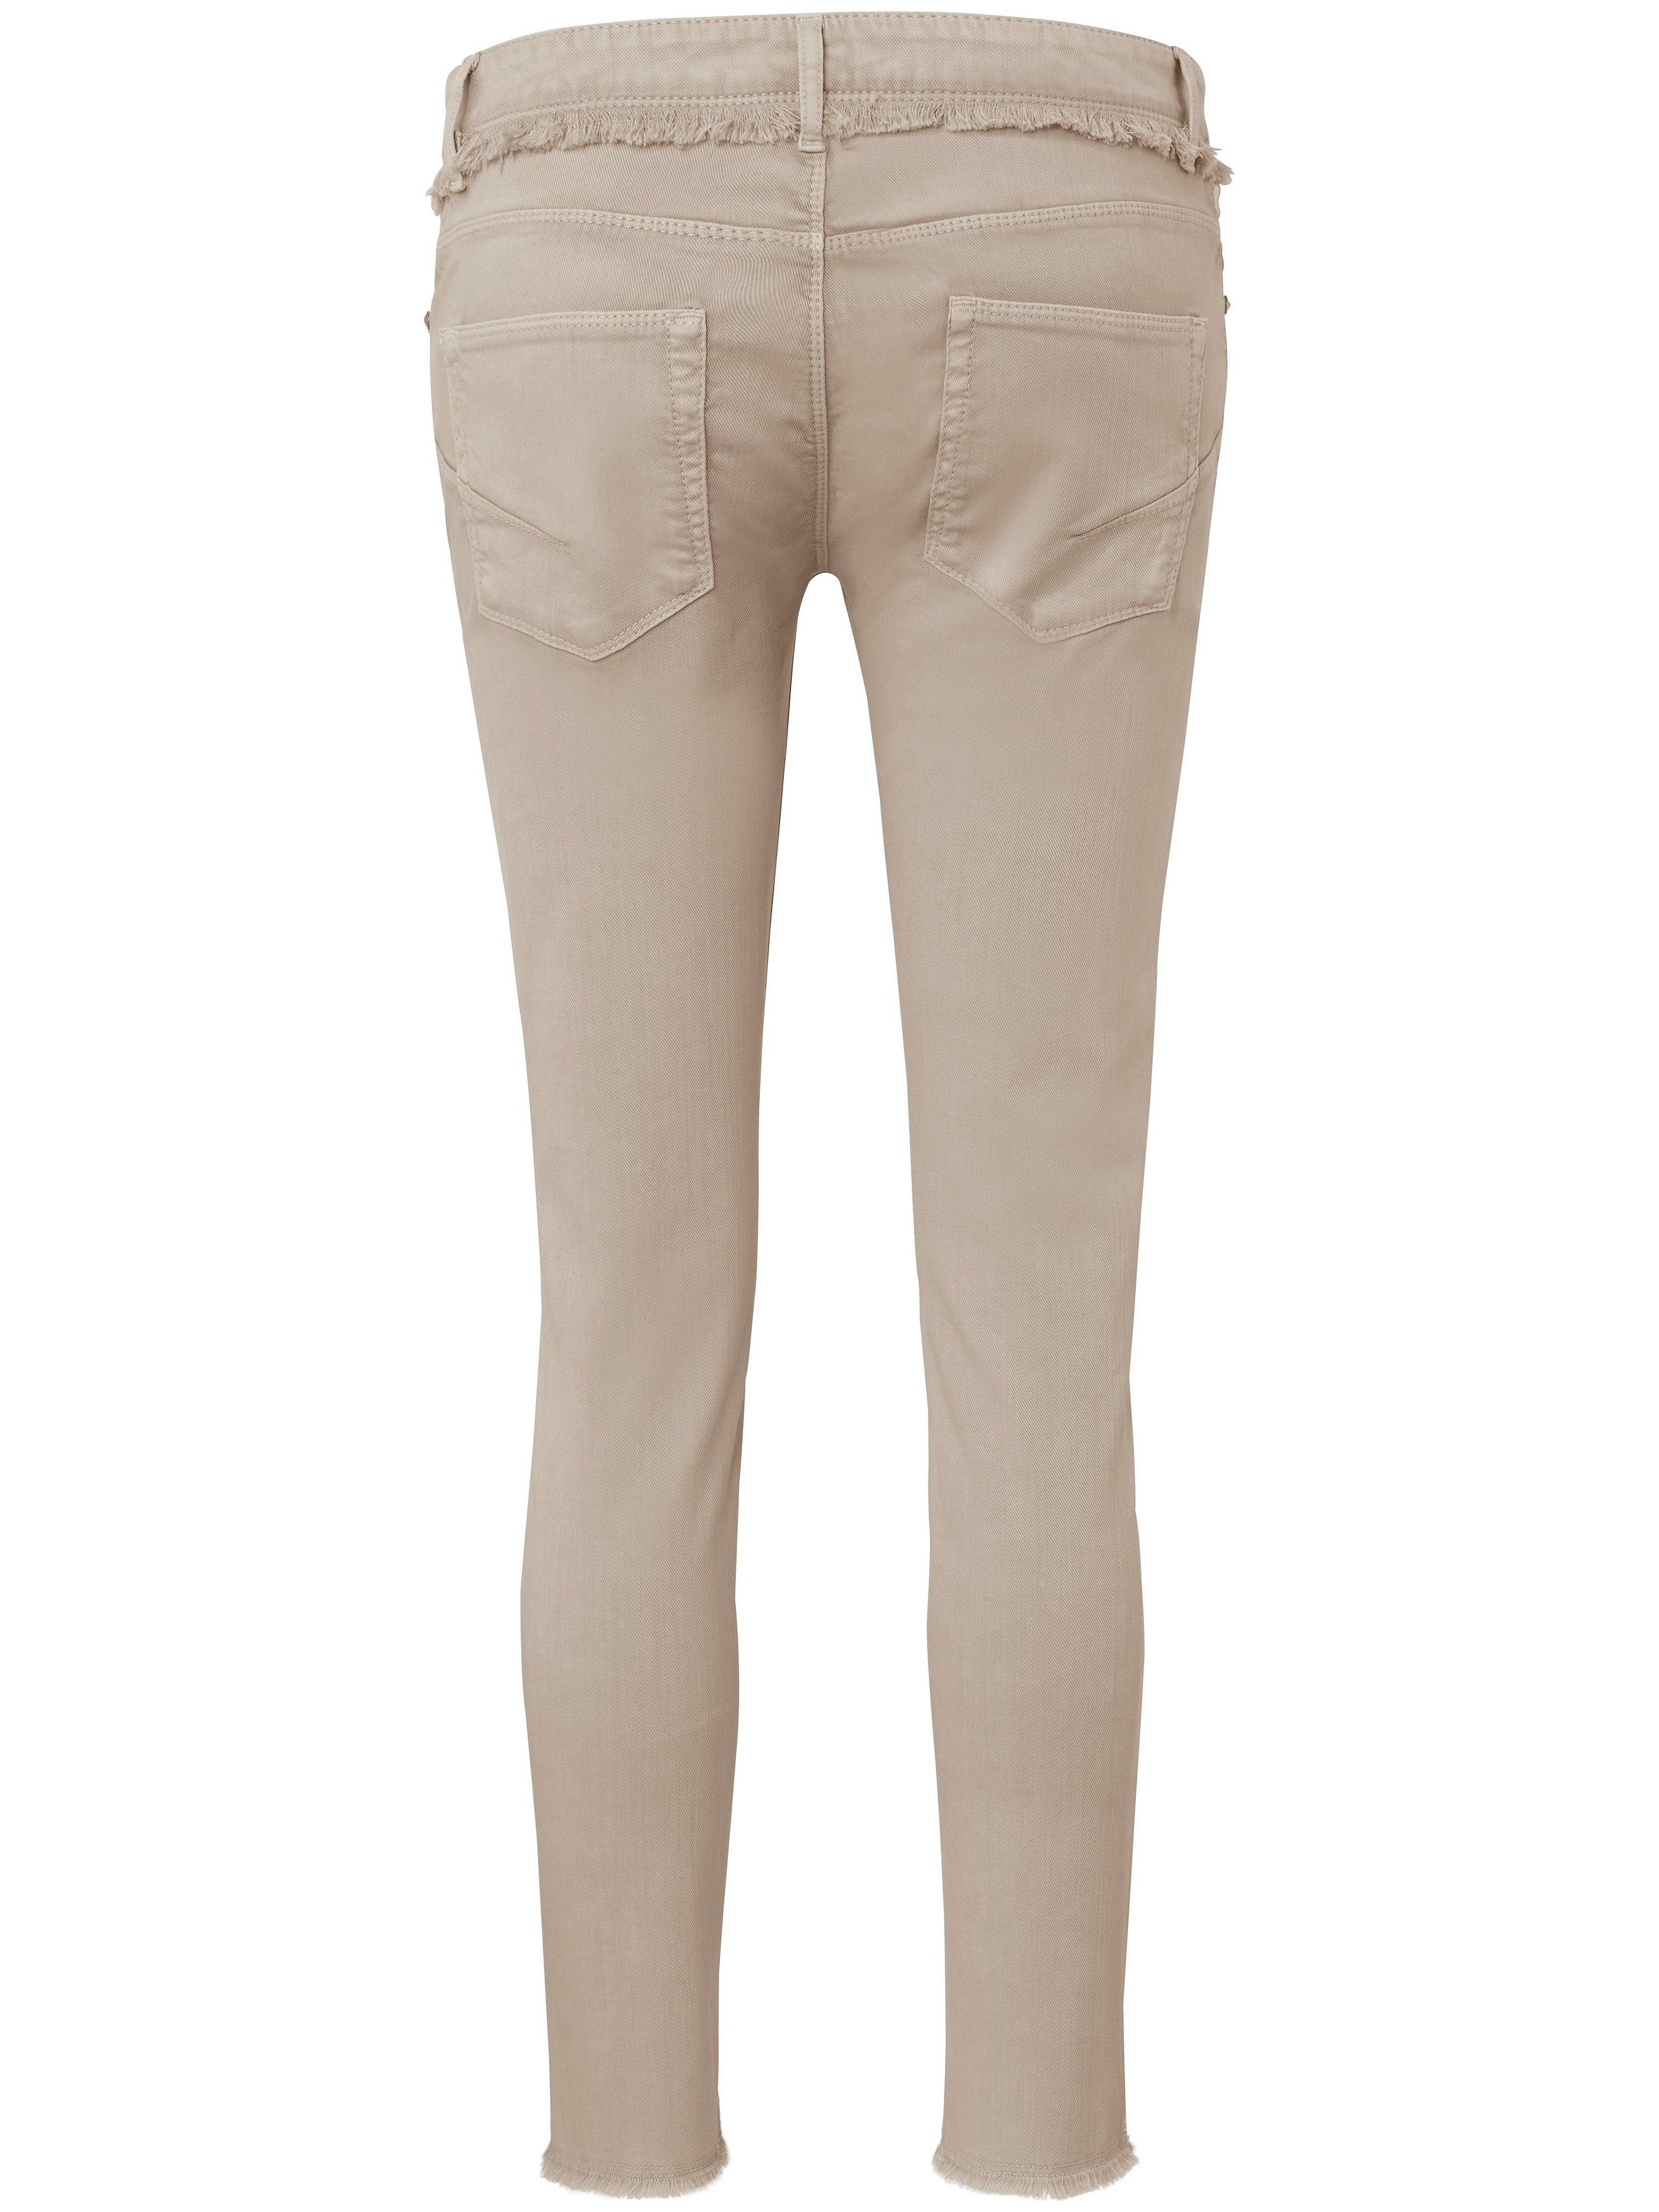 DAY.LIKE Denim Knöchellange slim fit-jeans in Natur 0zAfA